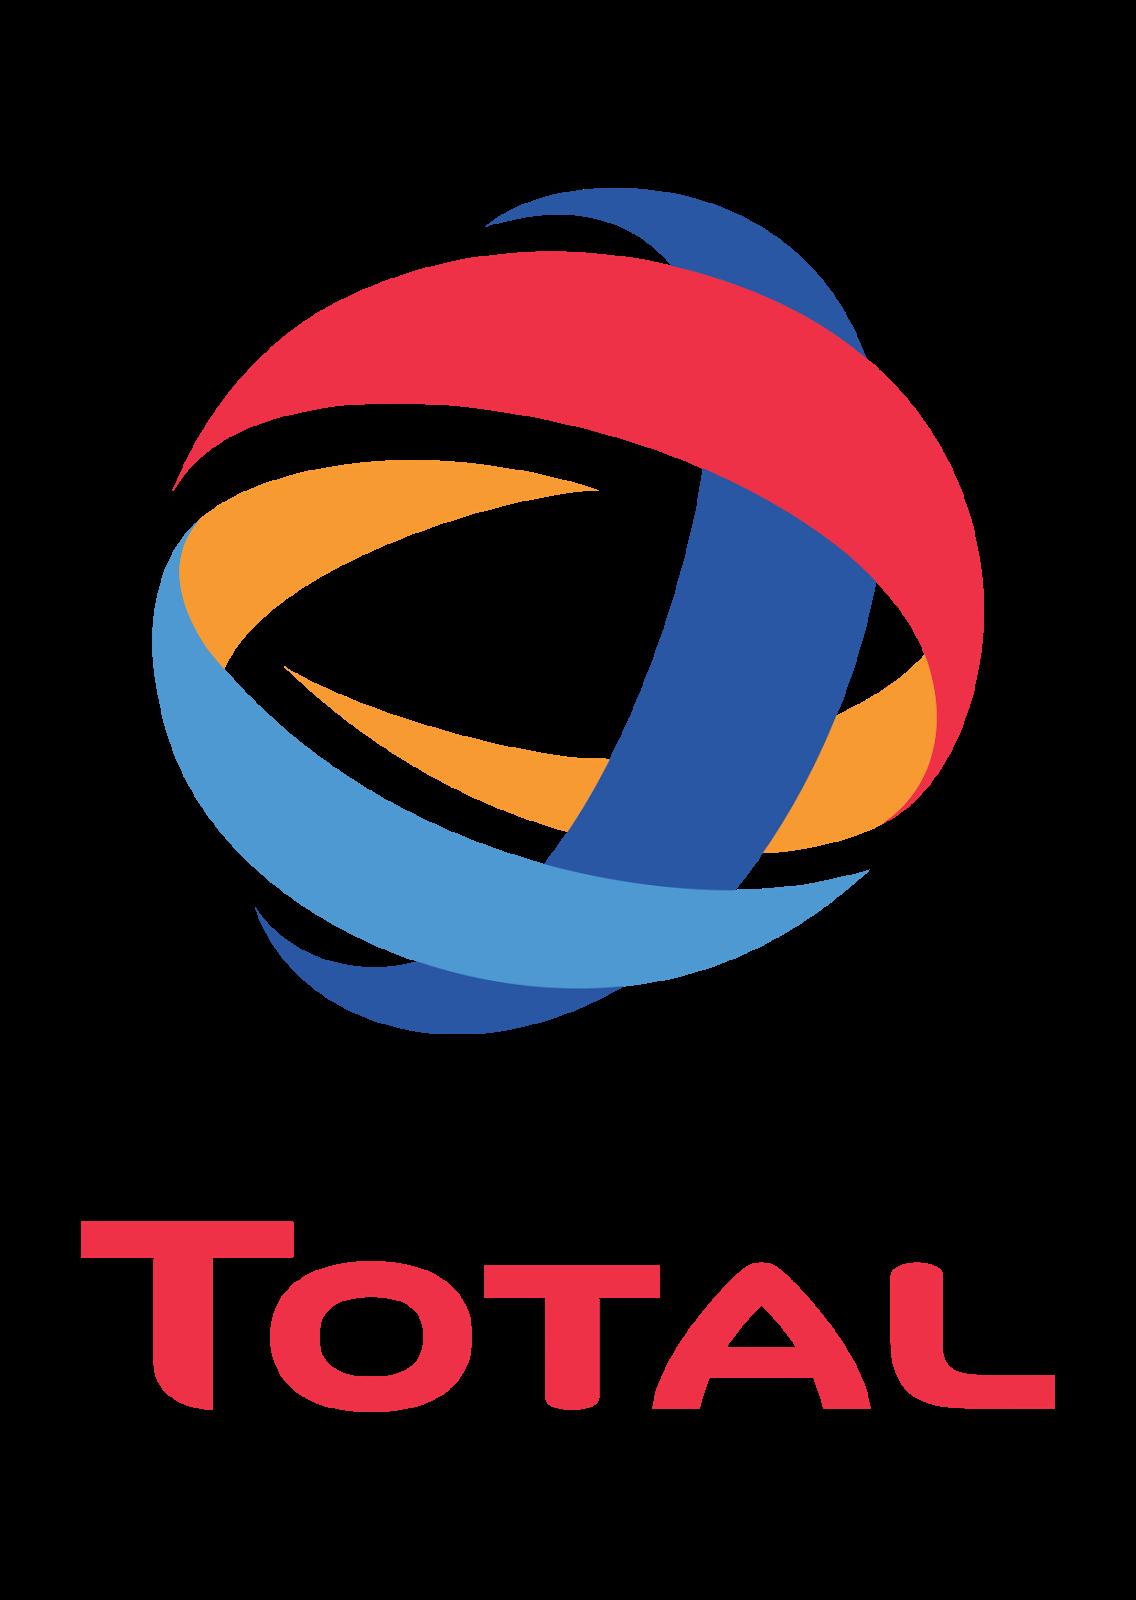 Total Logo Vector